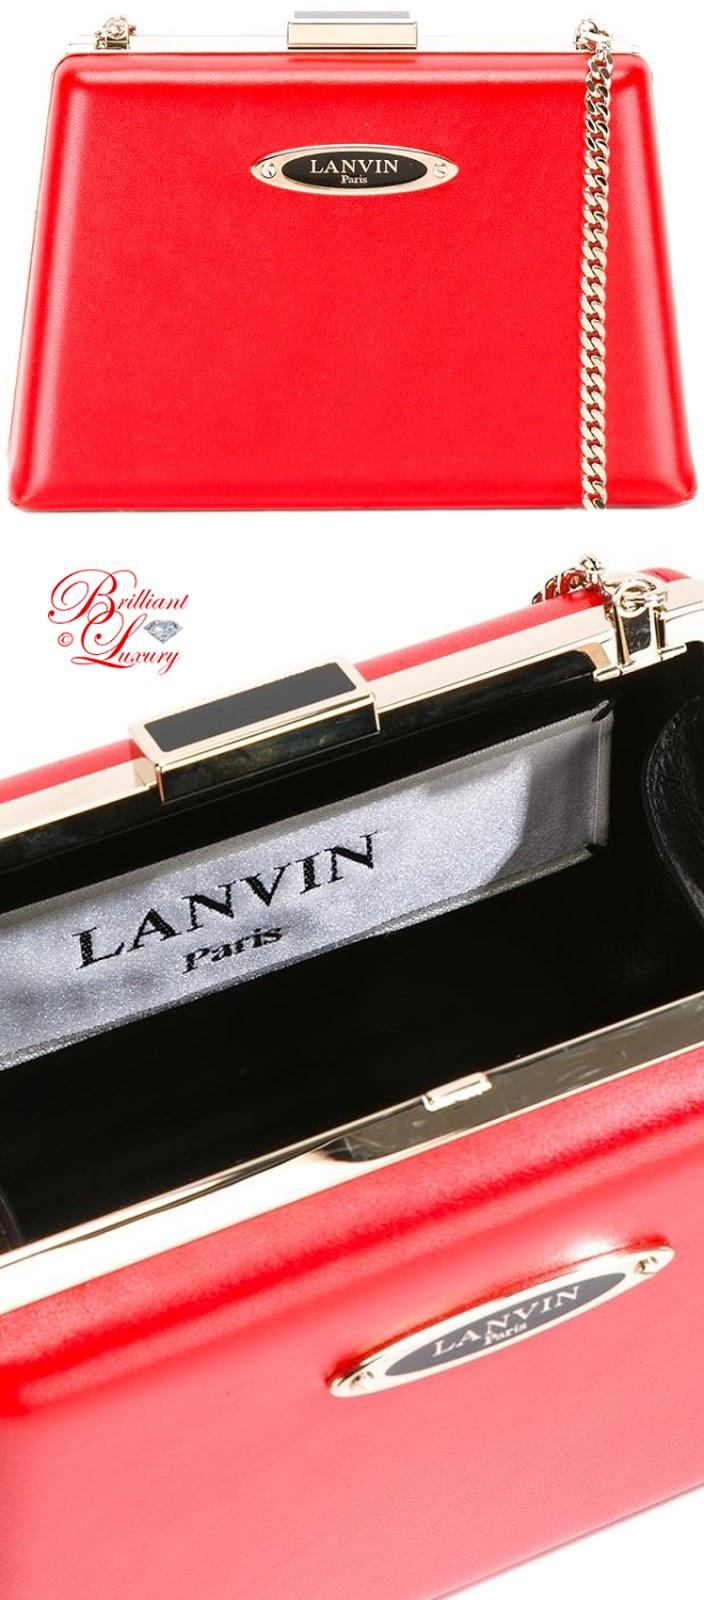 Brilliant Luxury ♦ Lanvin Compact Angular Crossbody Bag